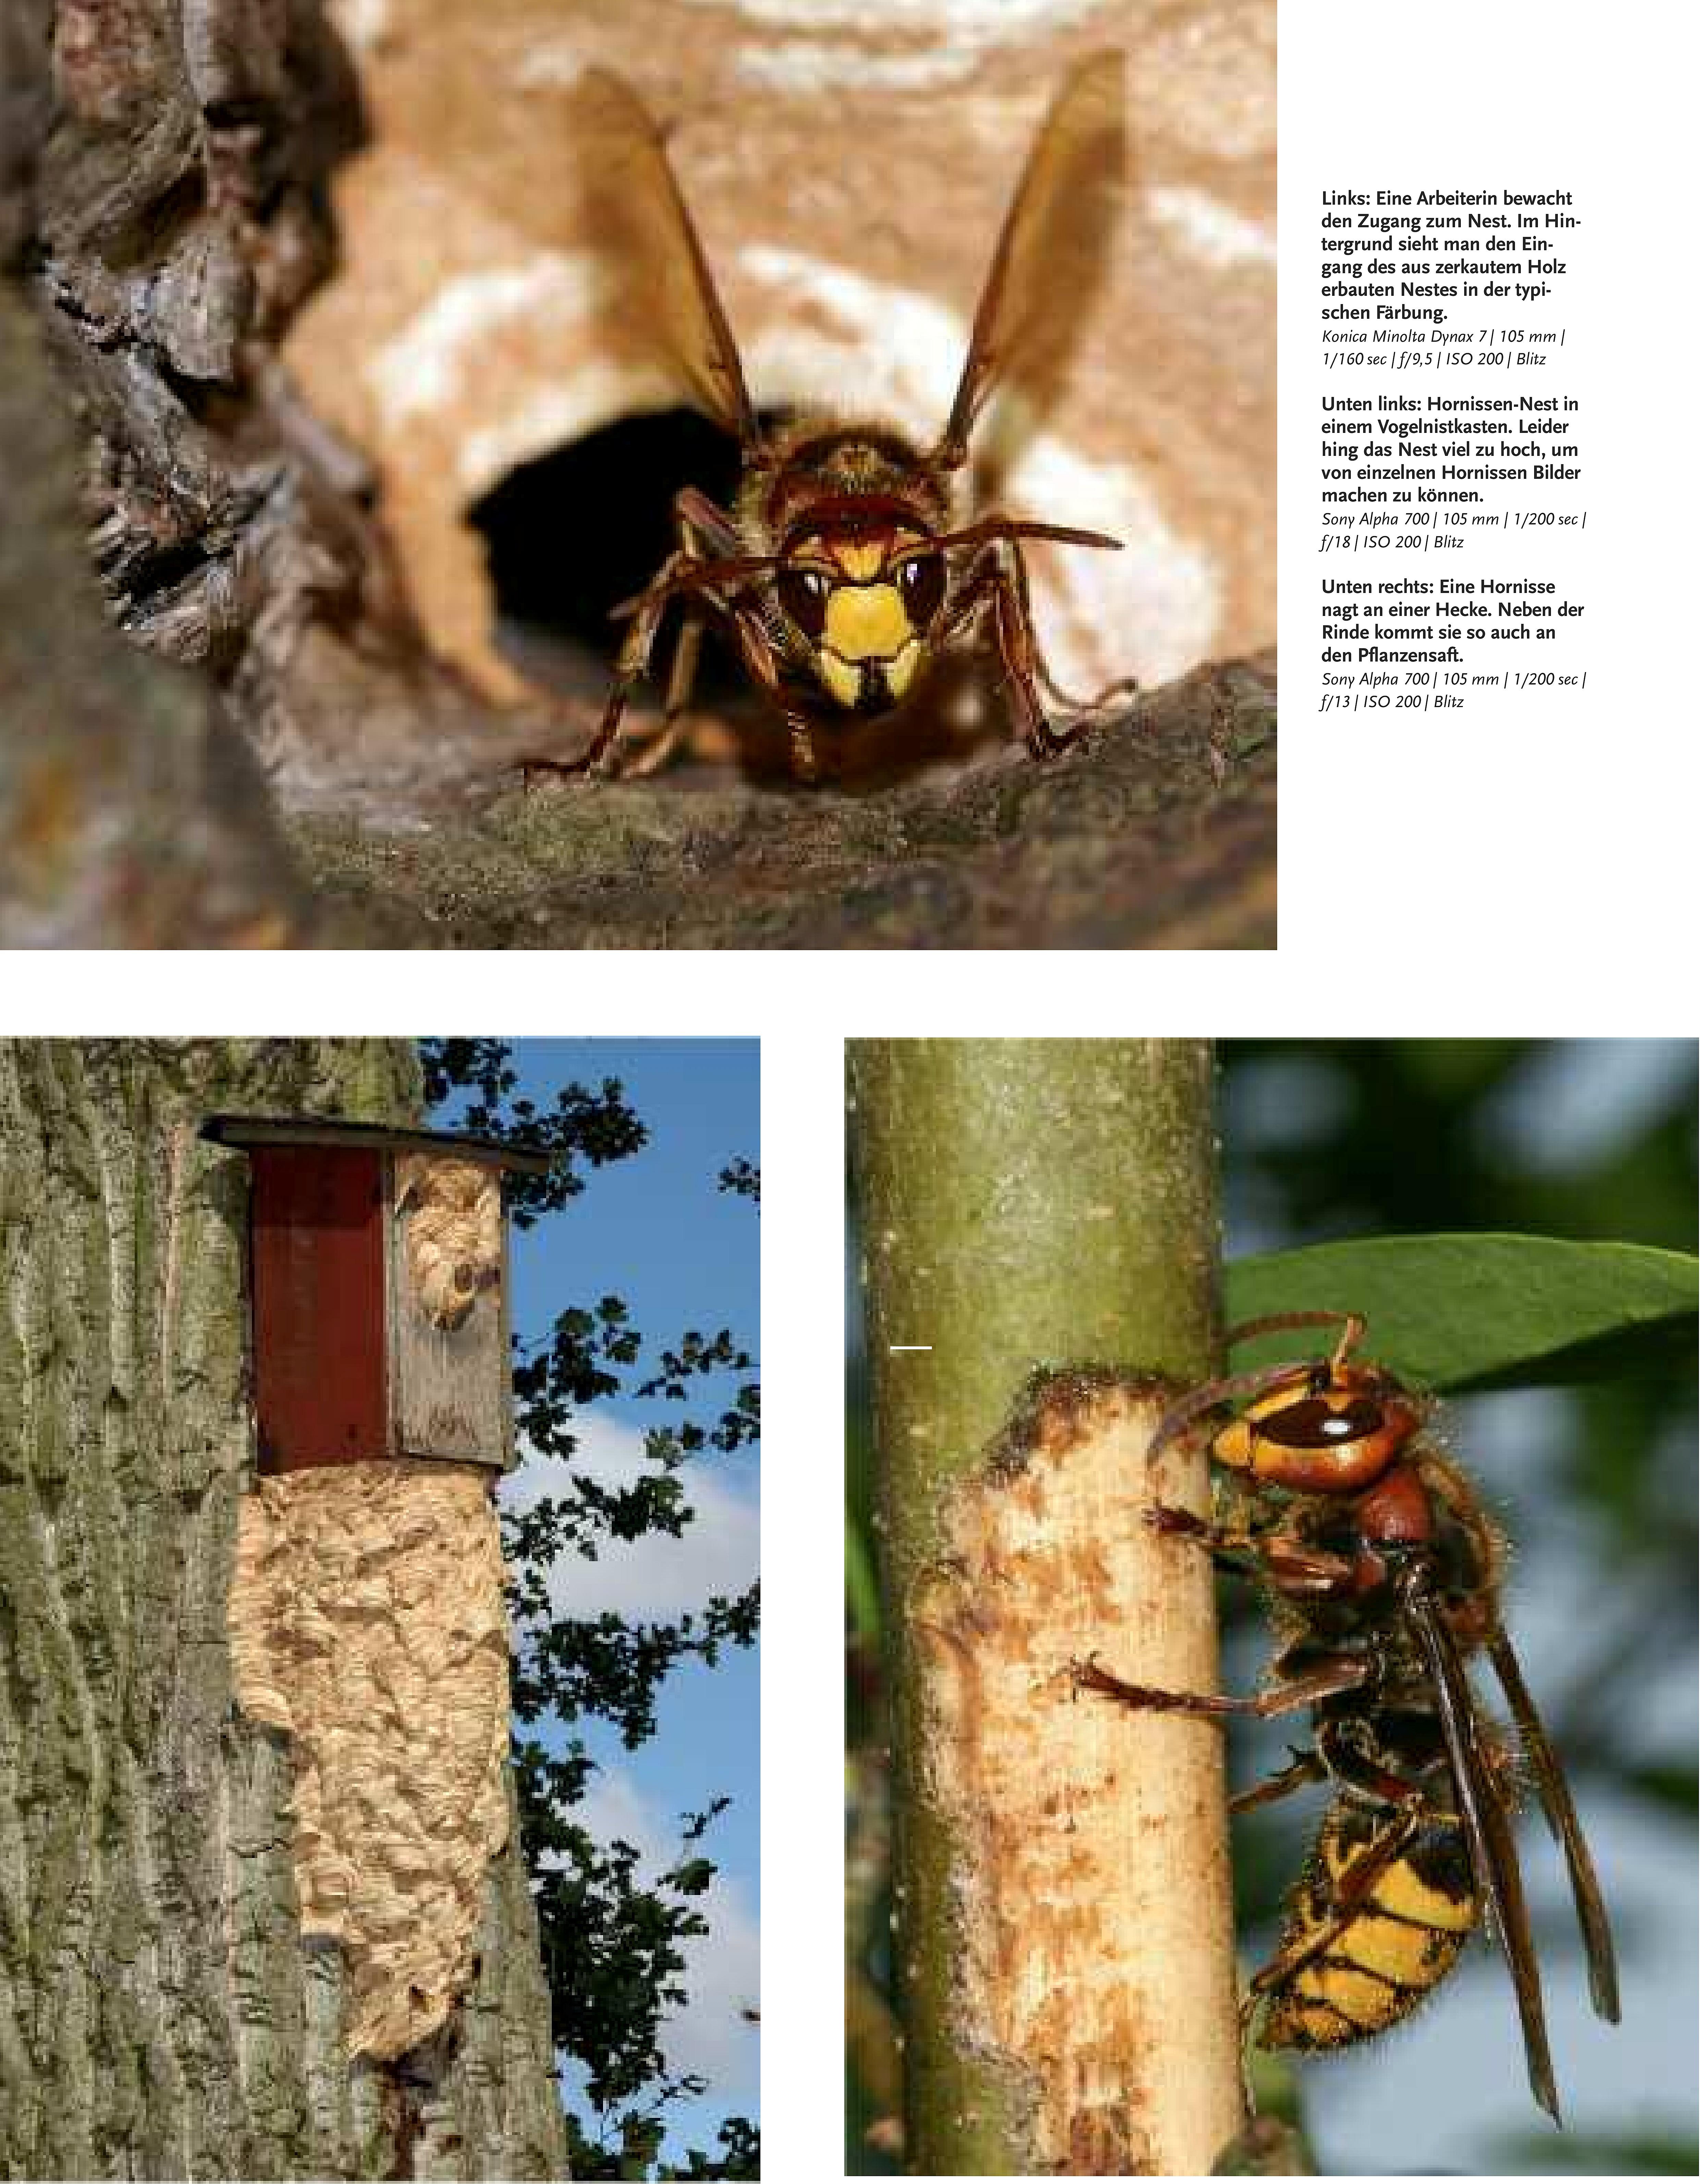 46-51 Haase Hornissen(2) Zeitschrift Natur-4